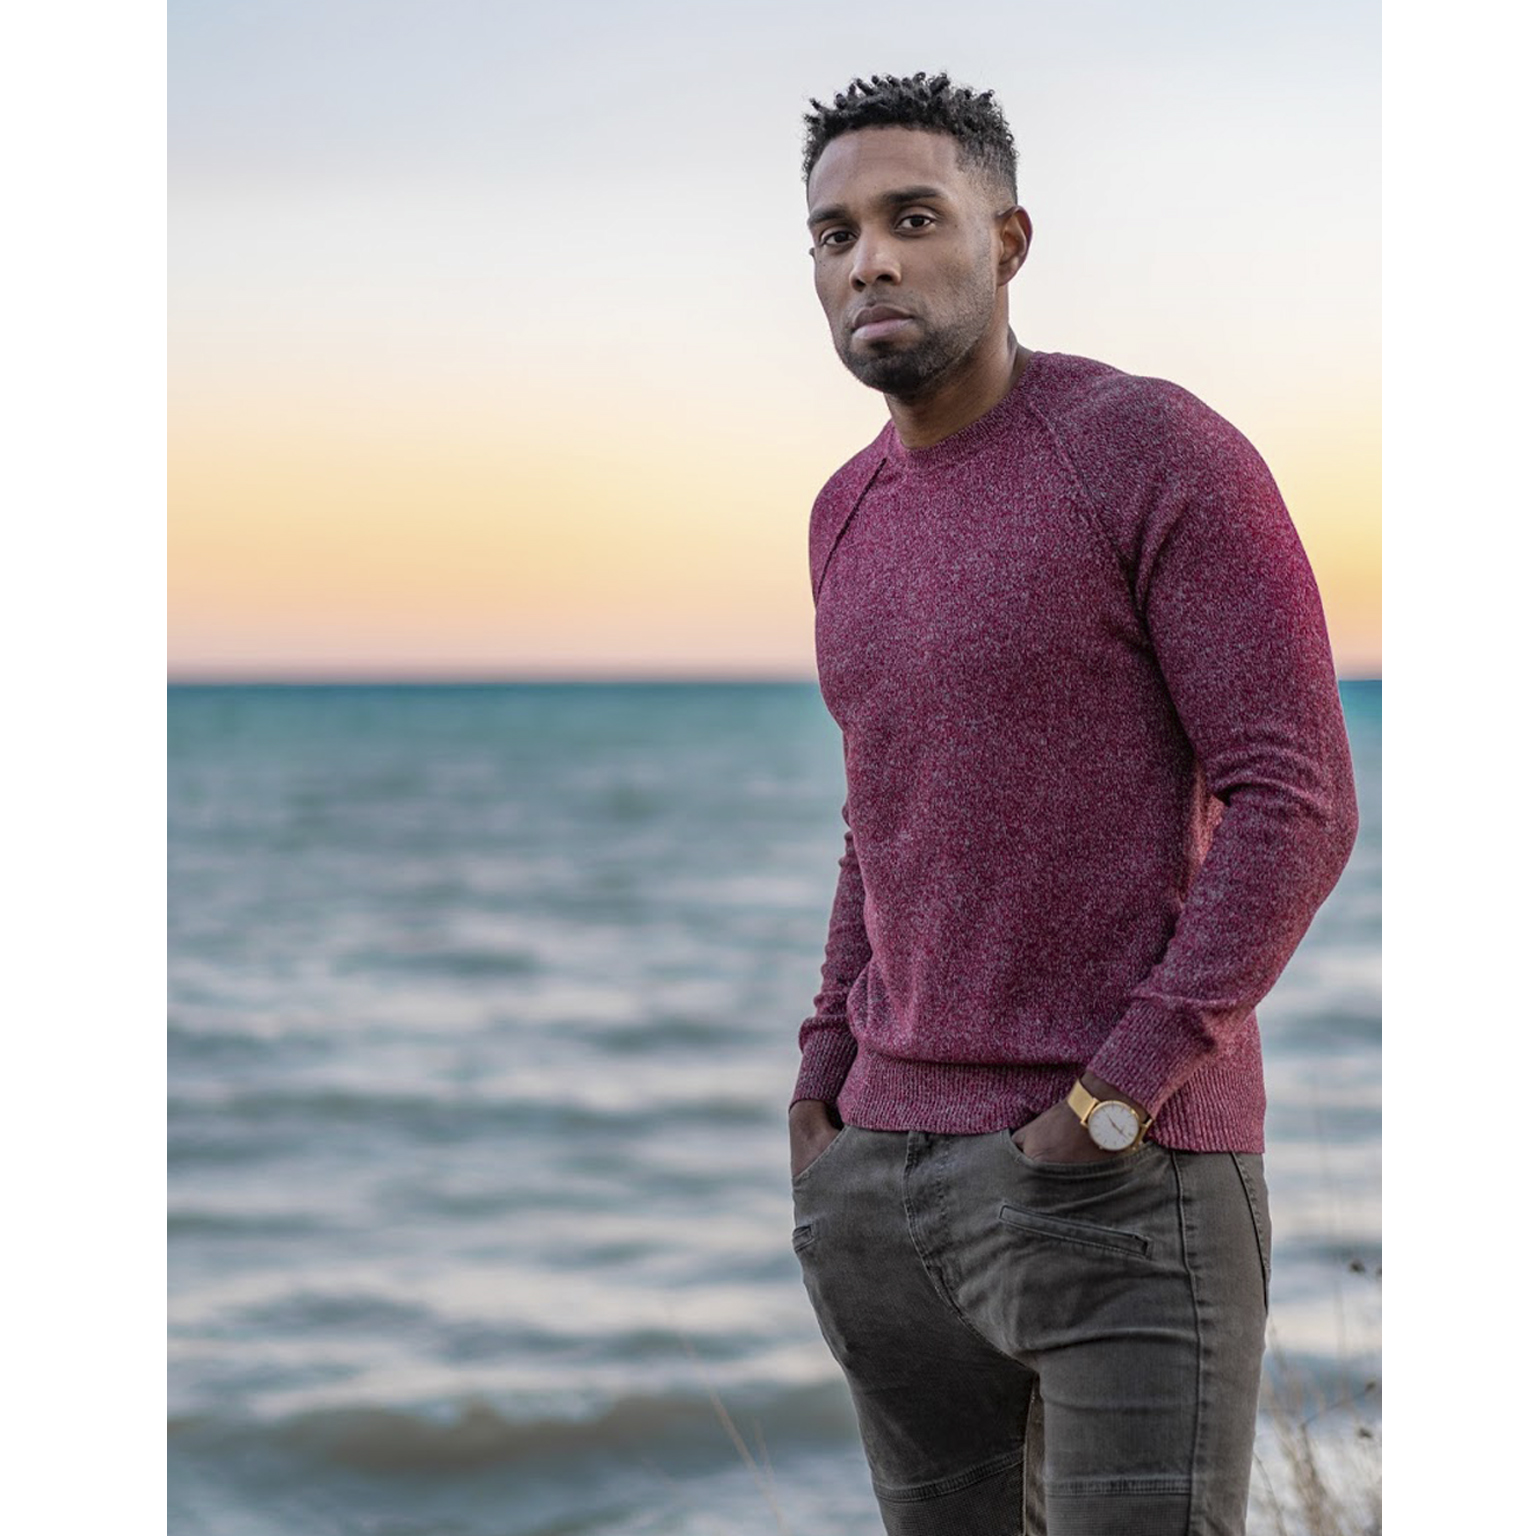 Toronto-Fitness-Model-Agency-Fitness-Casual-Commercial-Reggie-Waterman-Model-Lifestyle-Male-Model